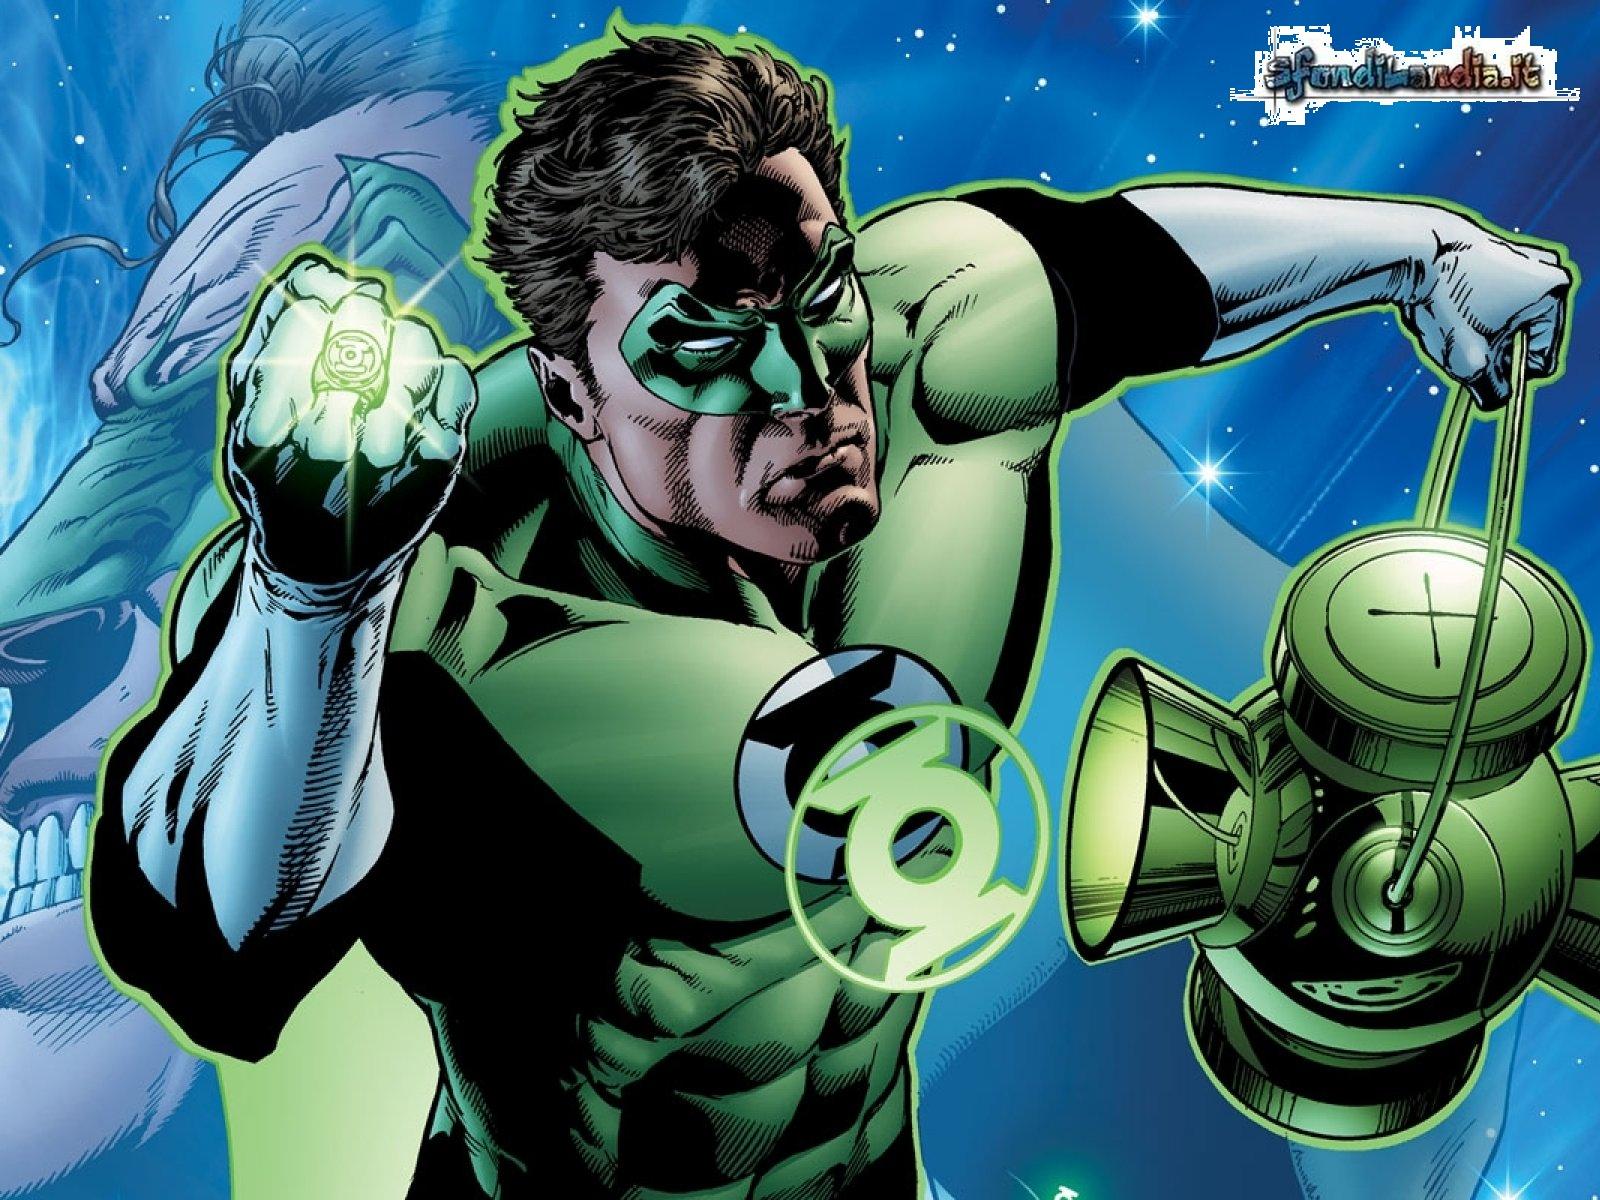 Green Lantern Comic Wallpaper: Green Lantern Wallpaper Screensaver